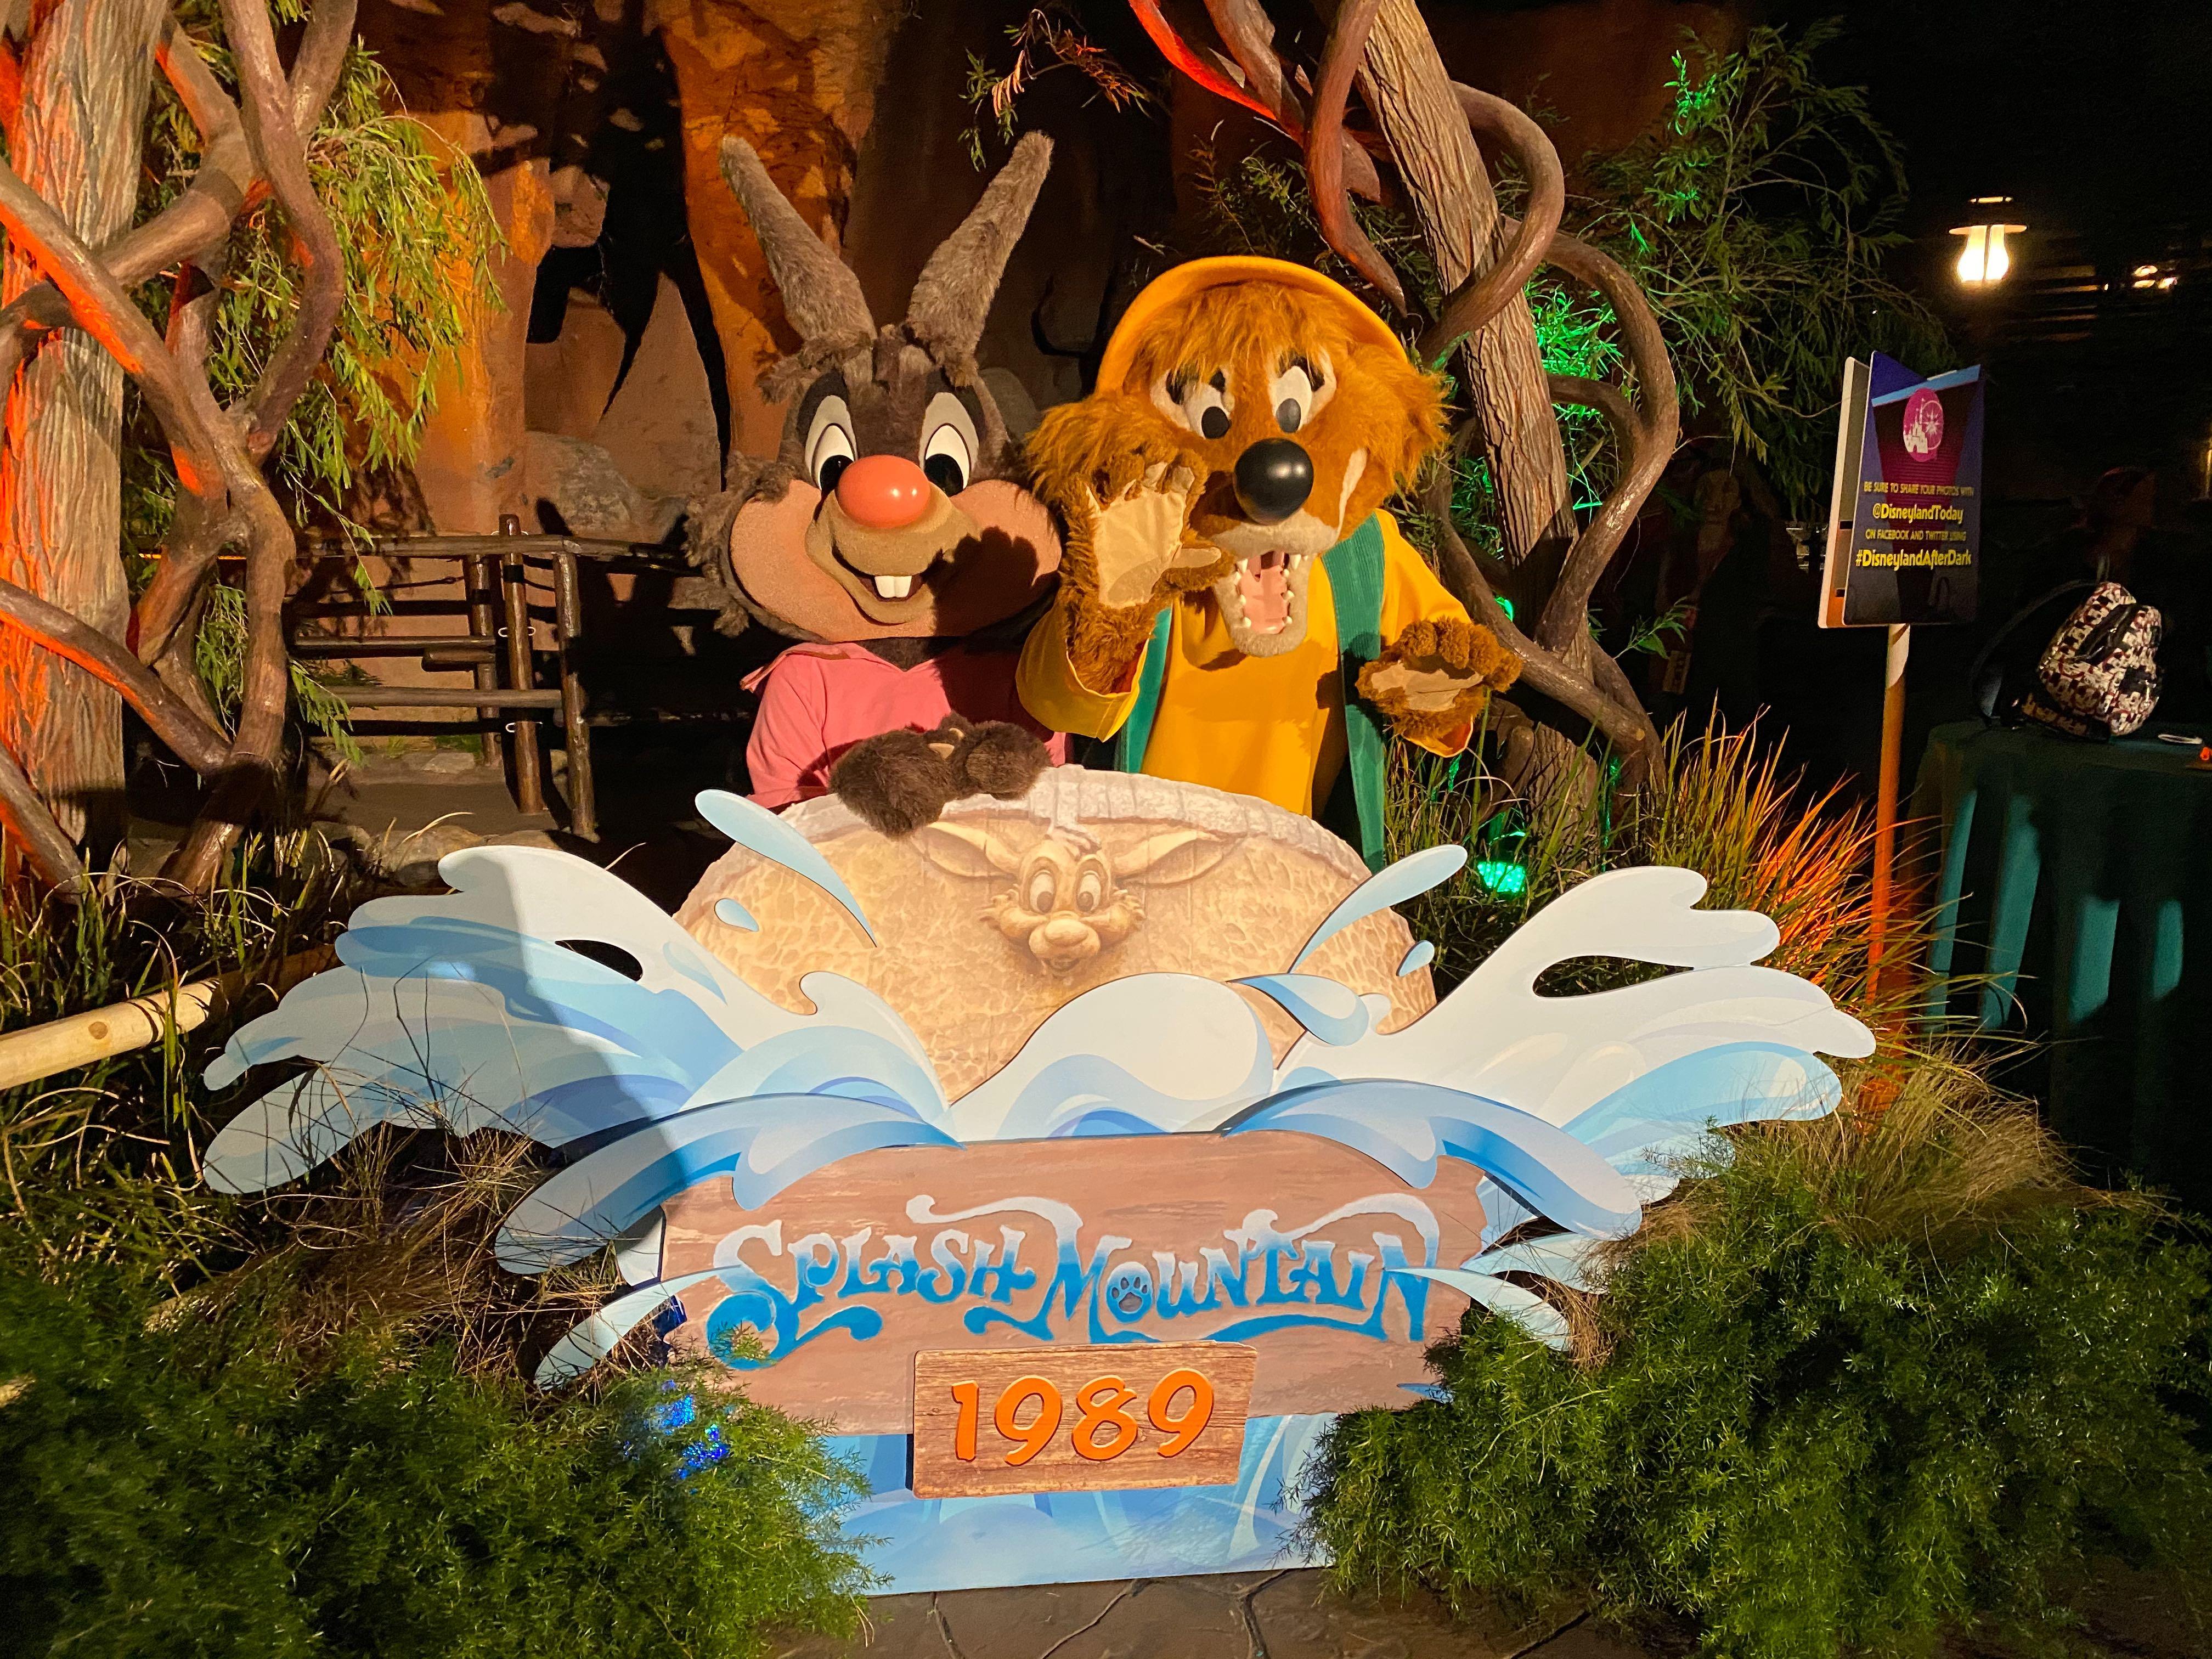 Brer Rabbit and Brer Fox Disneyland After Dark: 80's Nite